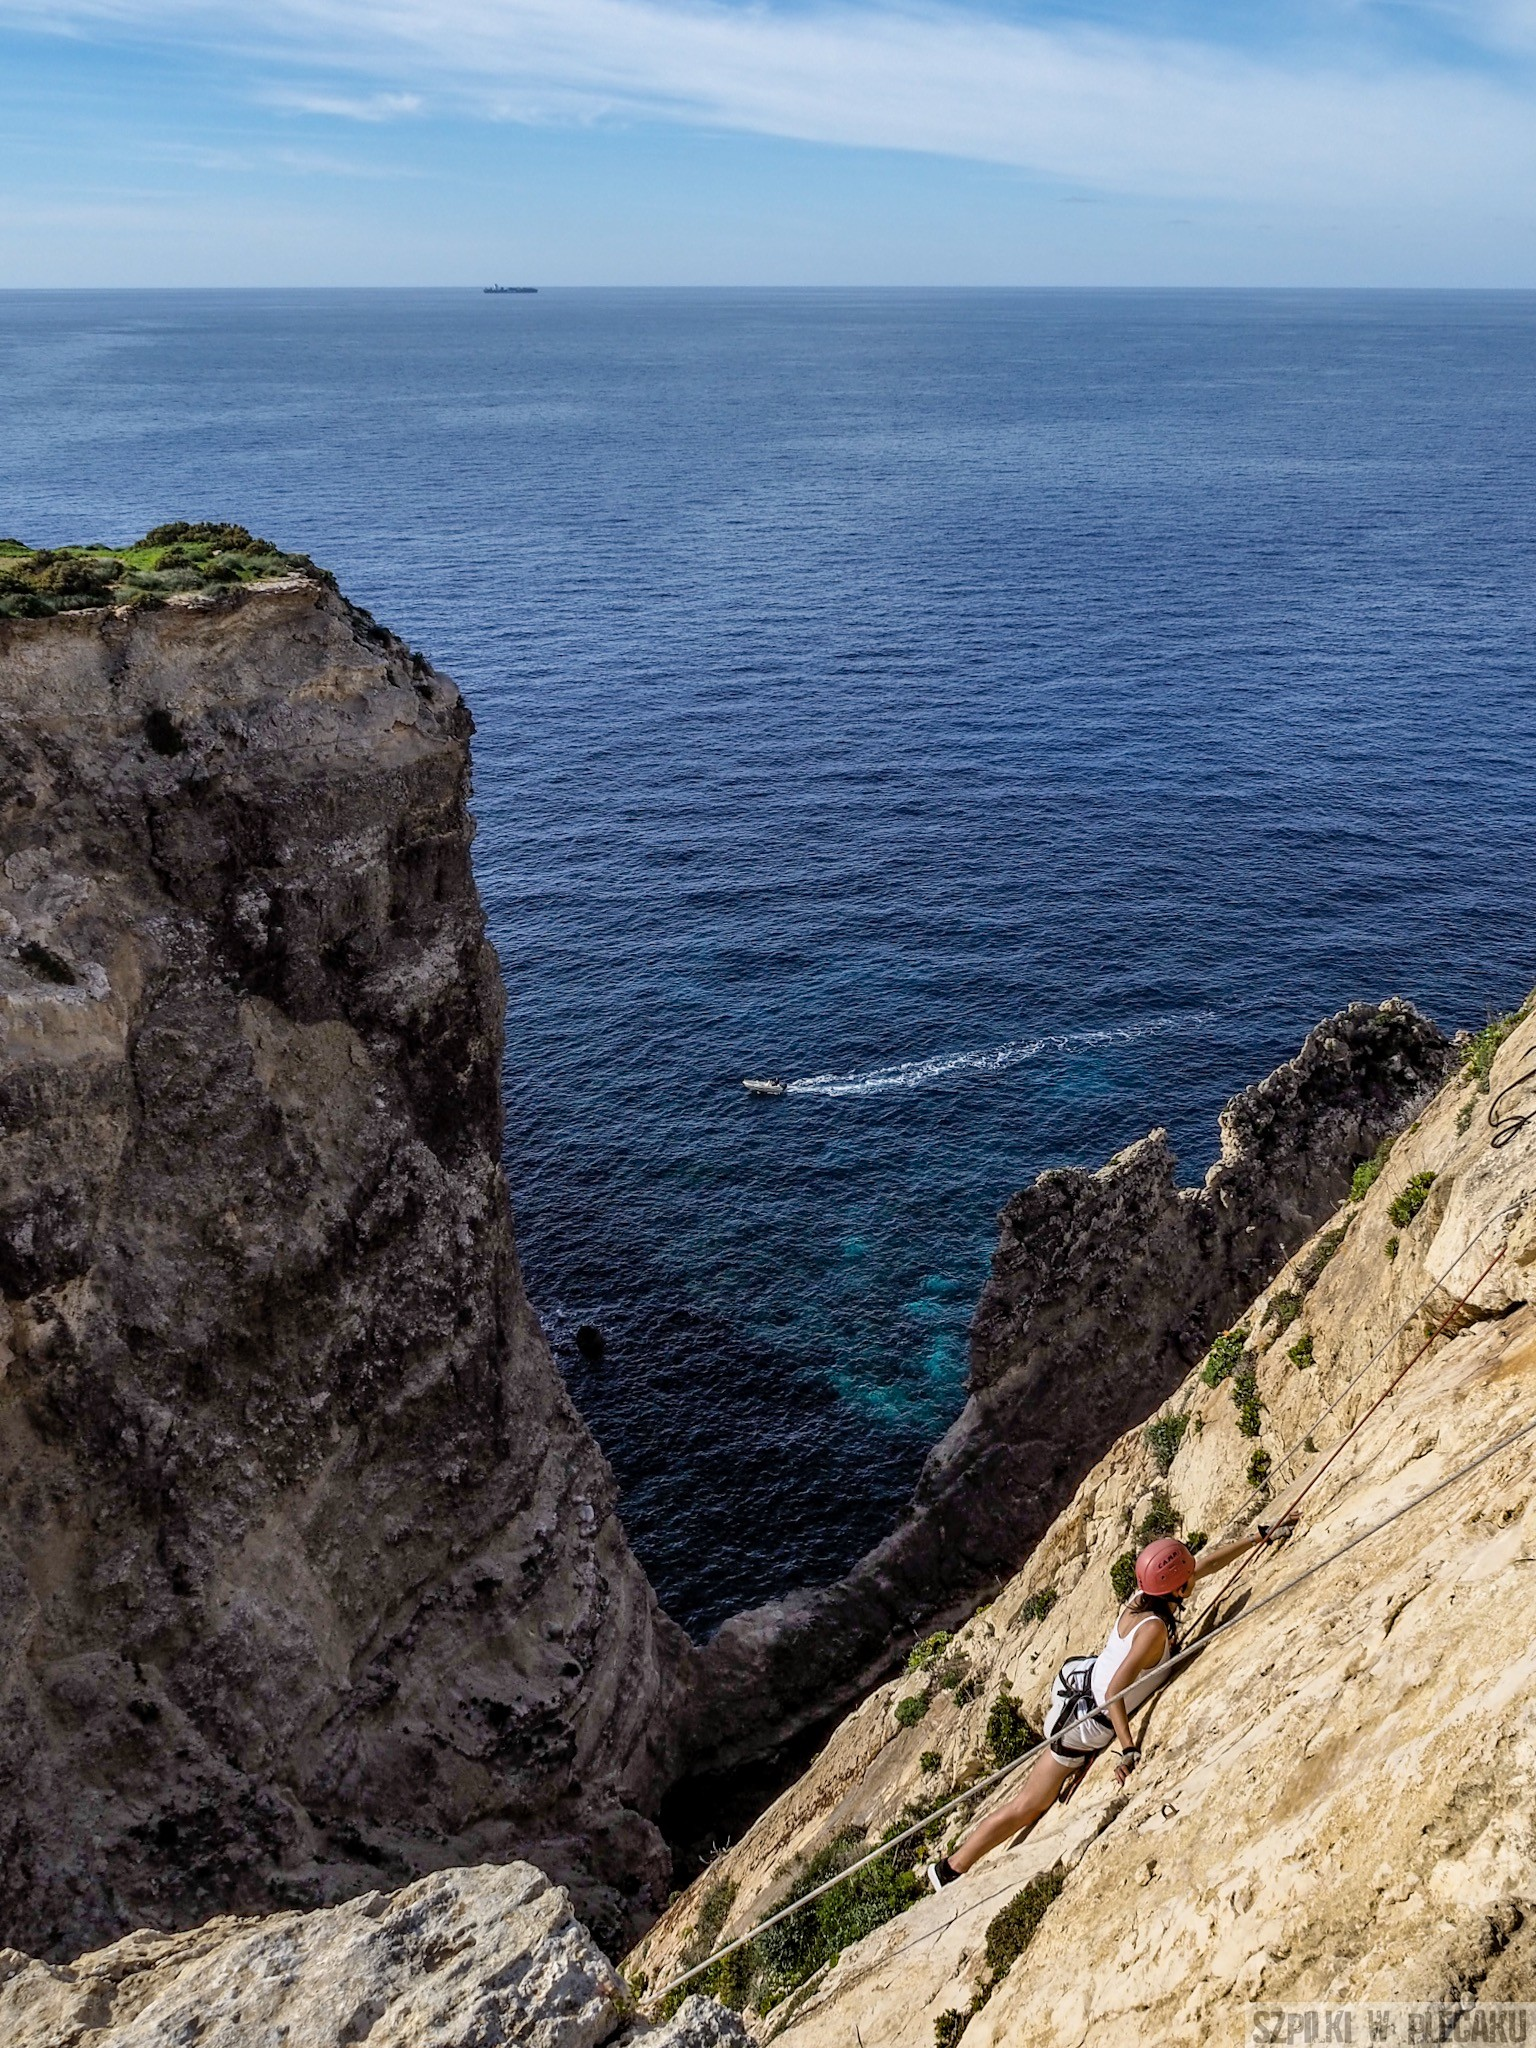 wspinacka Xaqqa cliffs z góry